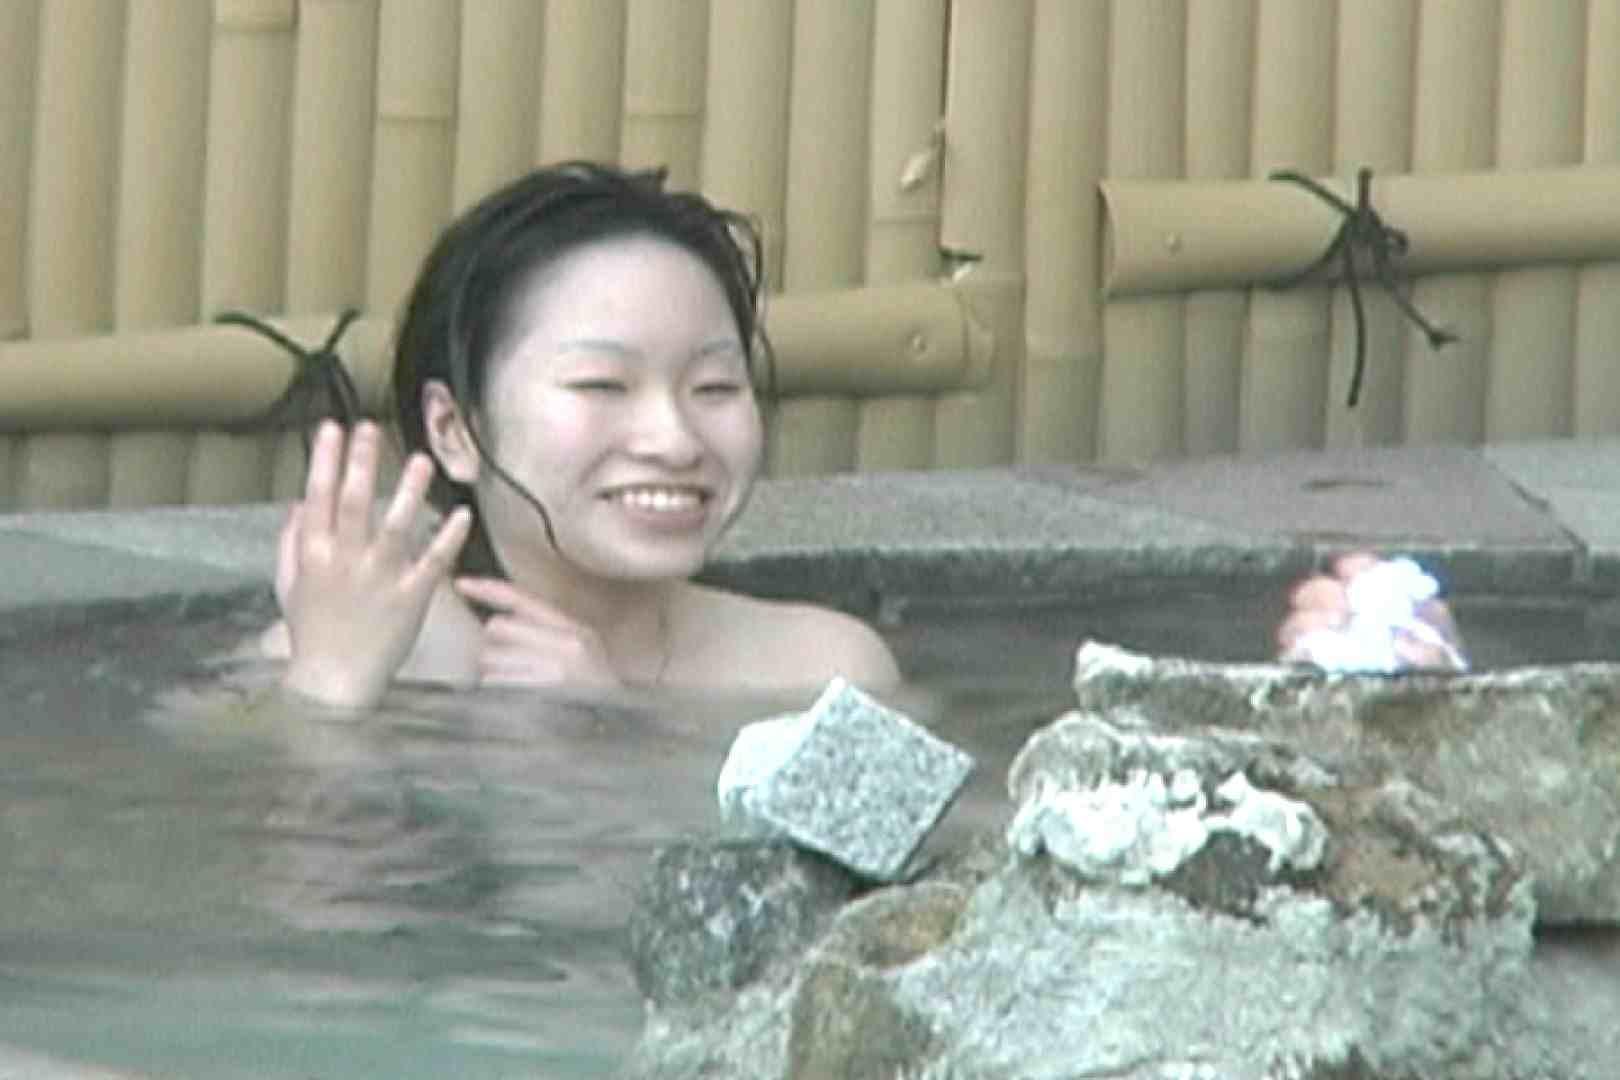 Aquaな露天風呂Vol.595 綺麗なOLたち エロ無料画像 112枚 83